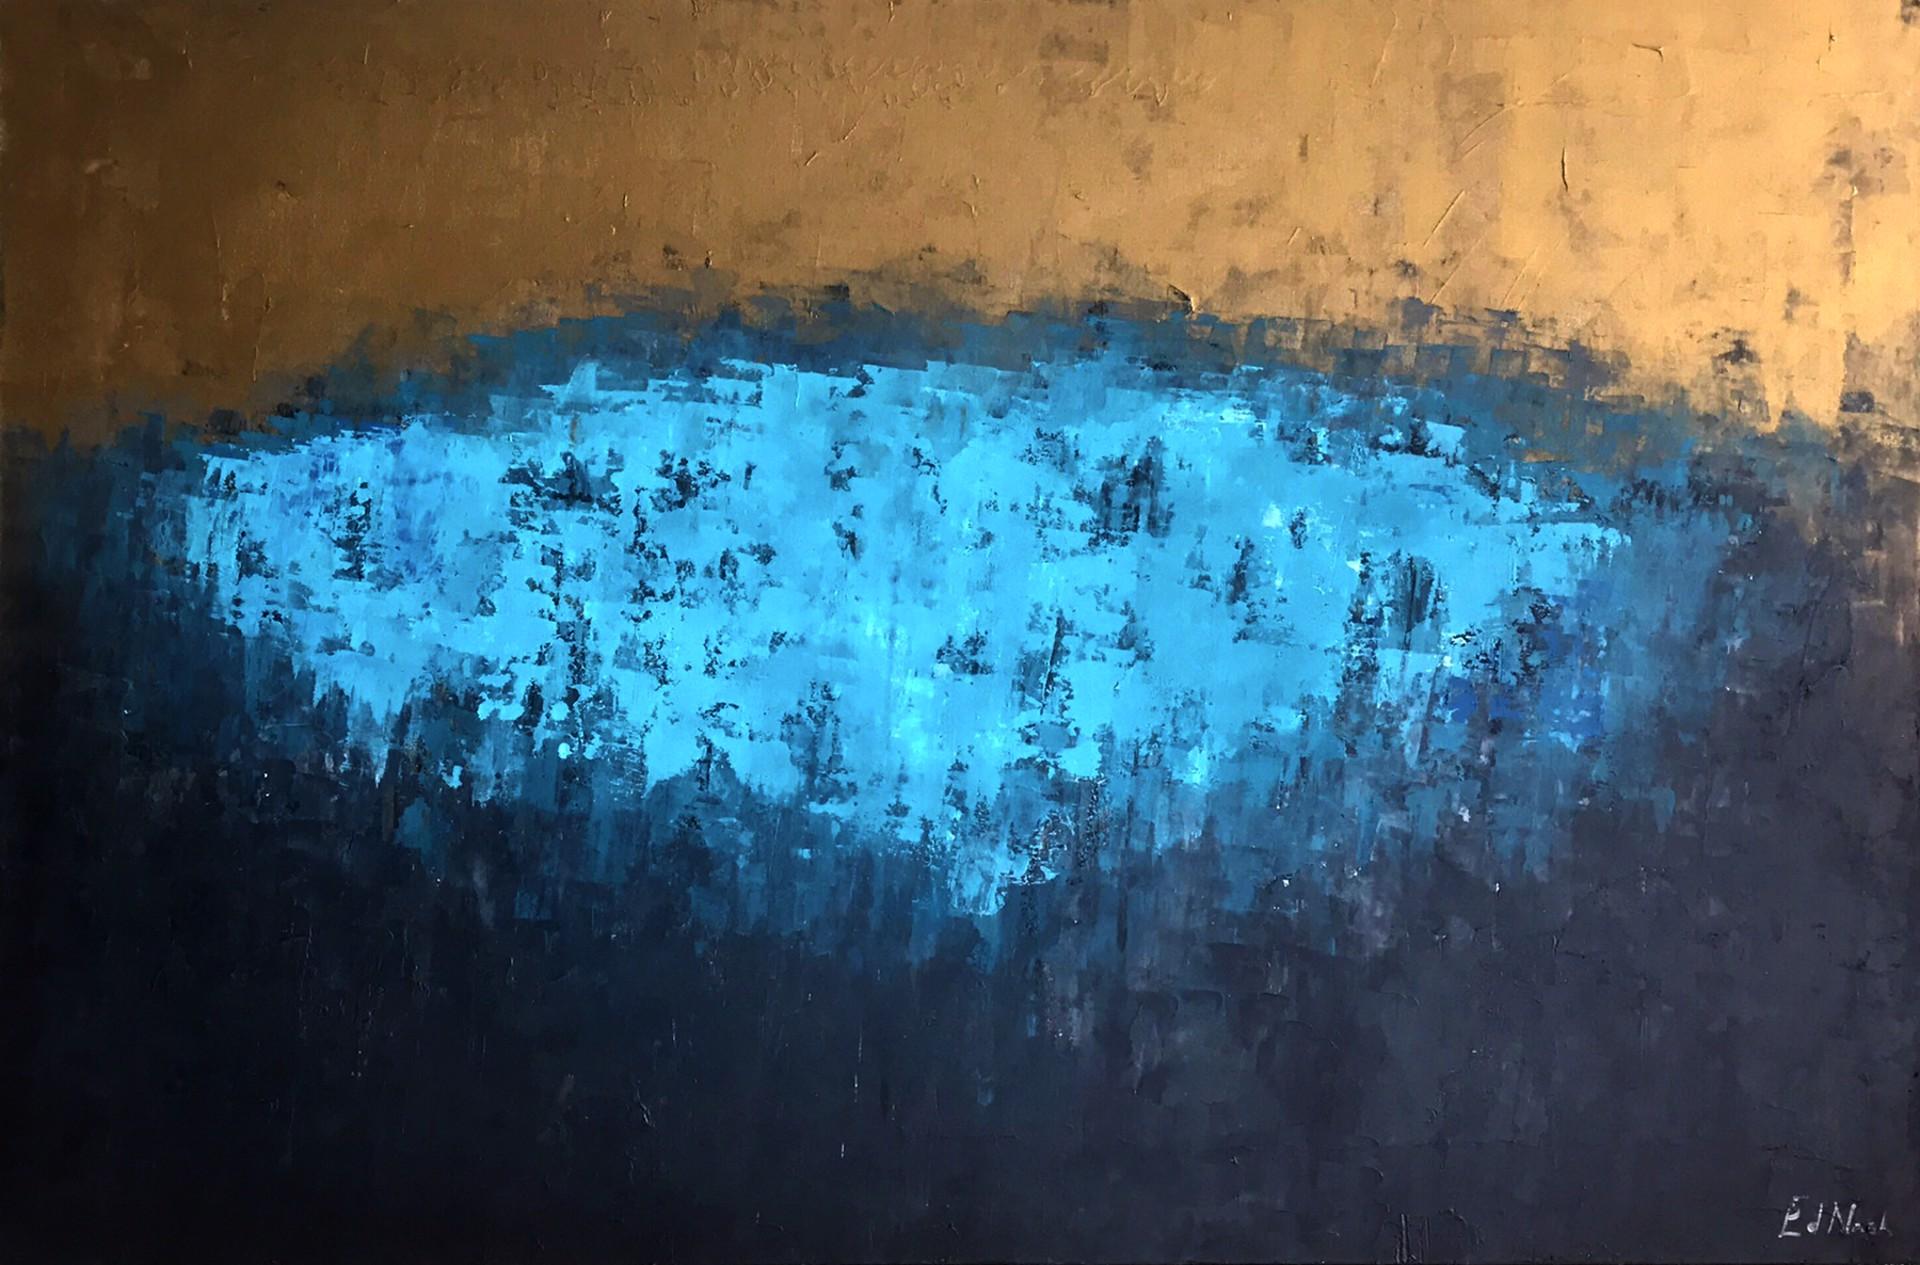 Ascent VI by Ed Nash